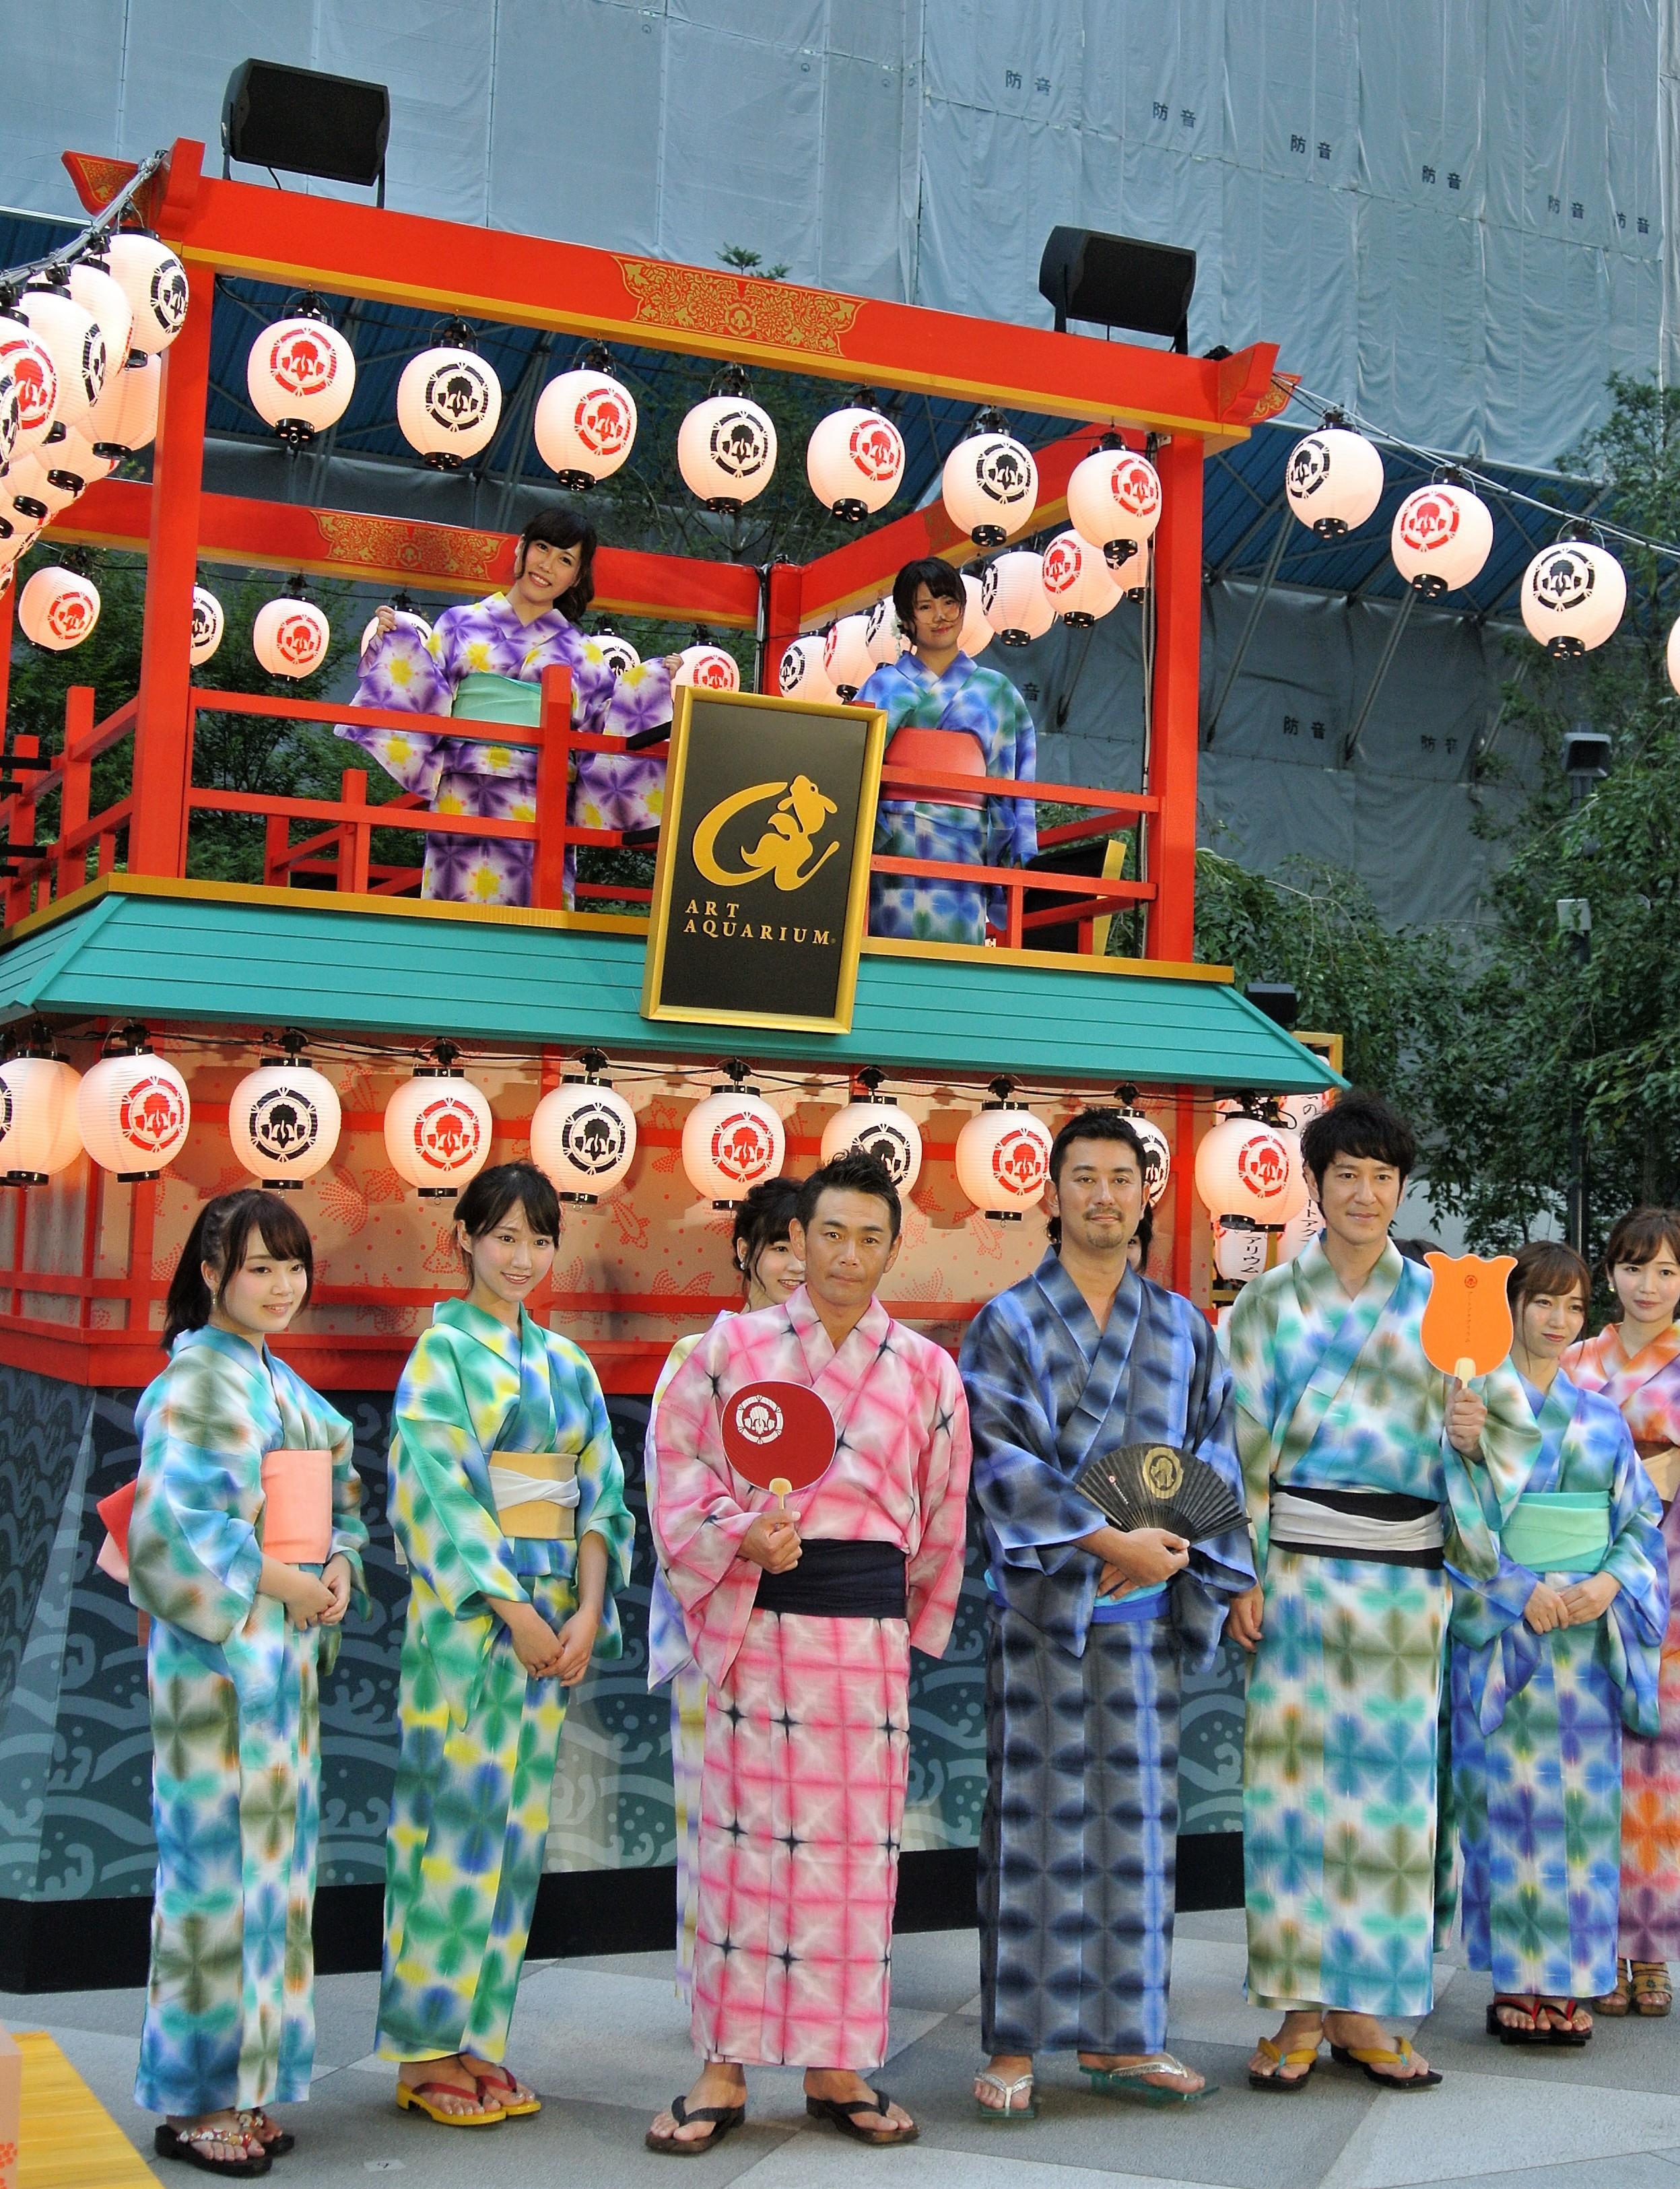 http://news.yoshimoto.co.jp/20170714203859-95610770a483ae9ec7d1a62491871b045dbe79d1.jpg